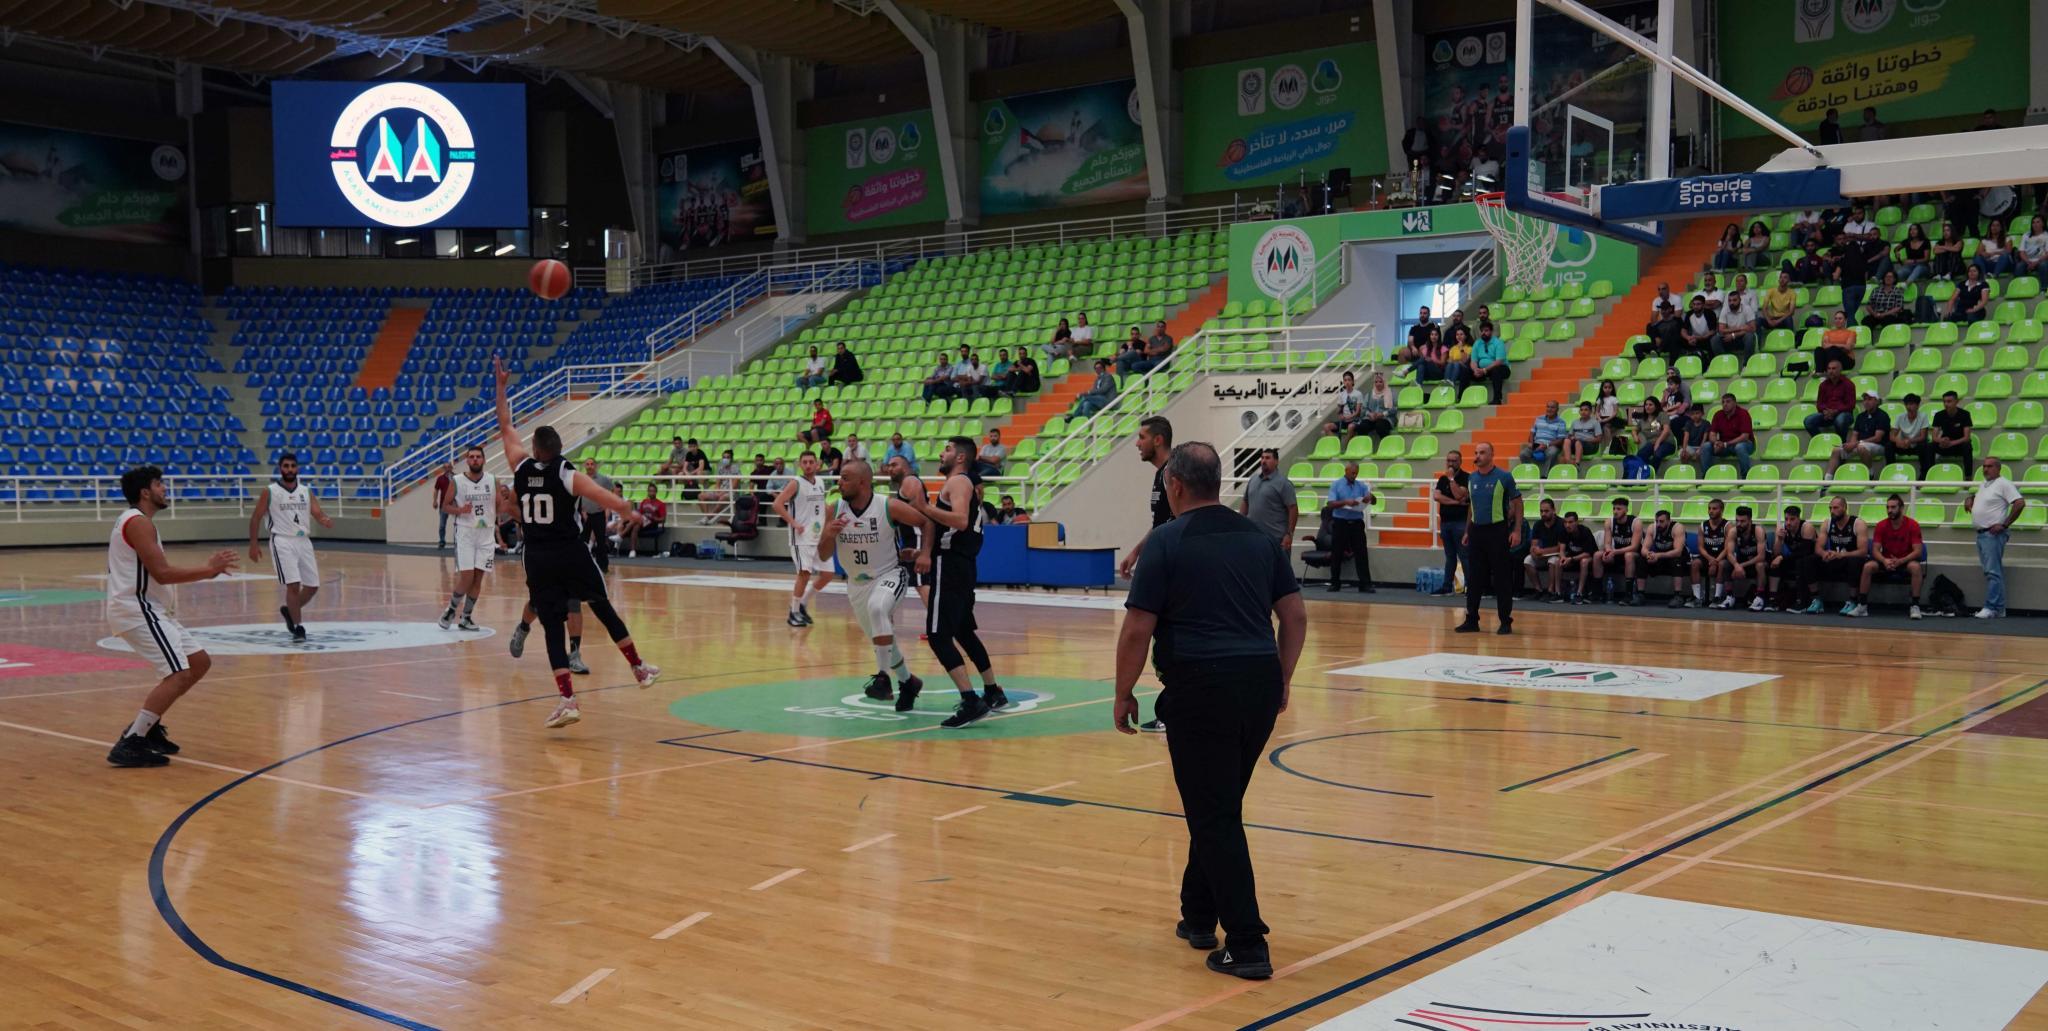 AAUP Hosts a Game between Sarreyet Ramallah Team and Orthodox Ramallah Club Team in its International Sports Hall